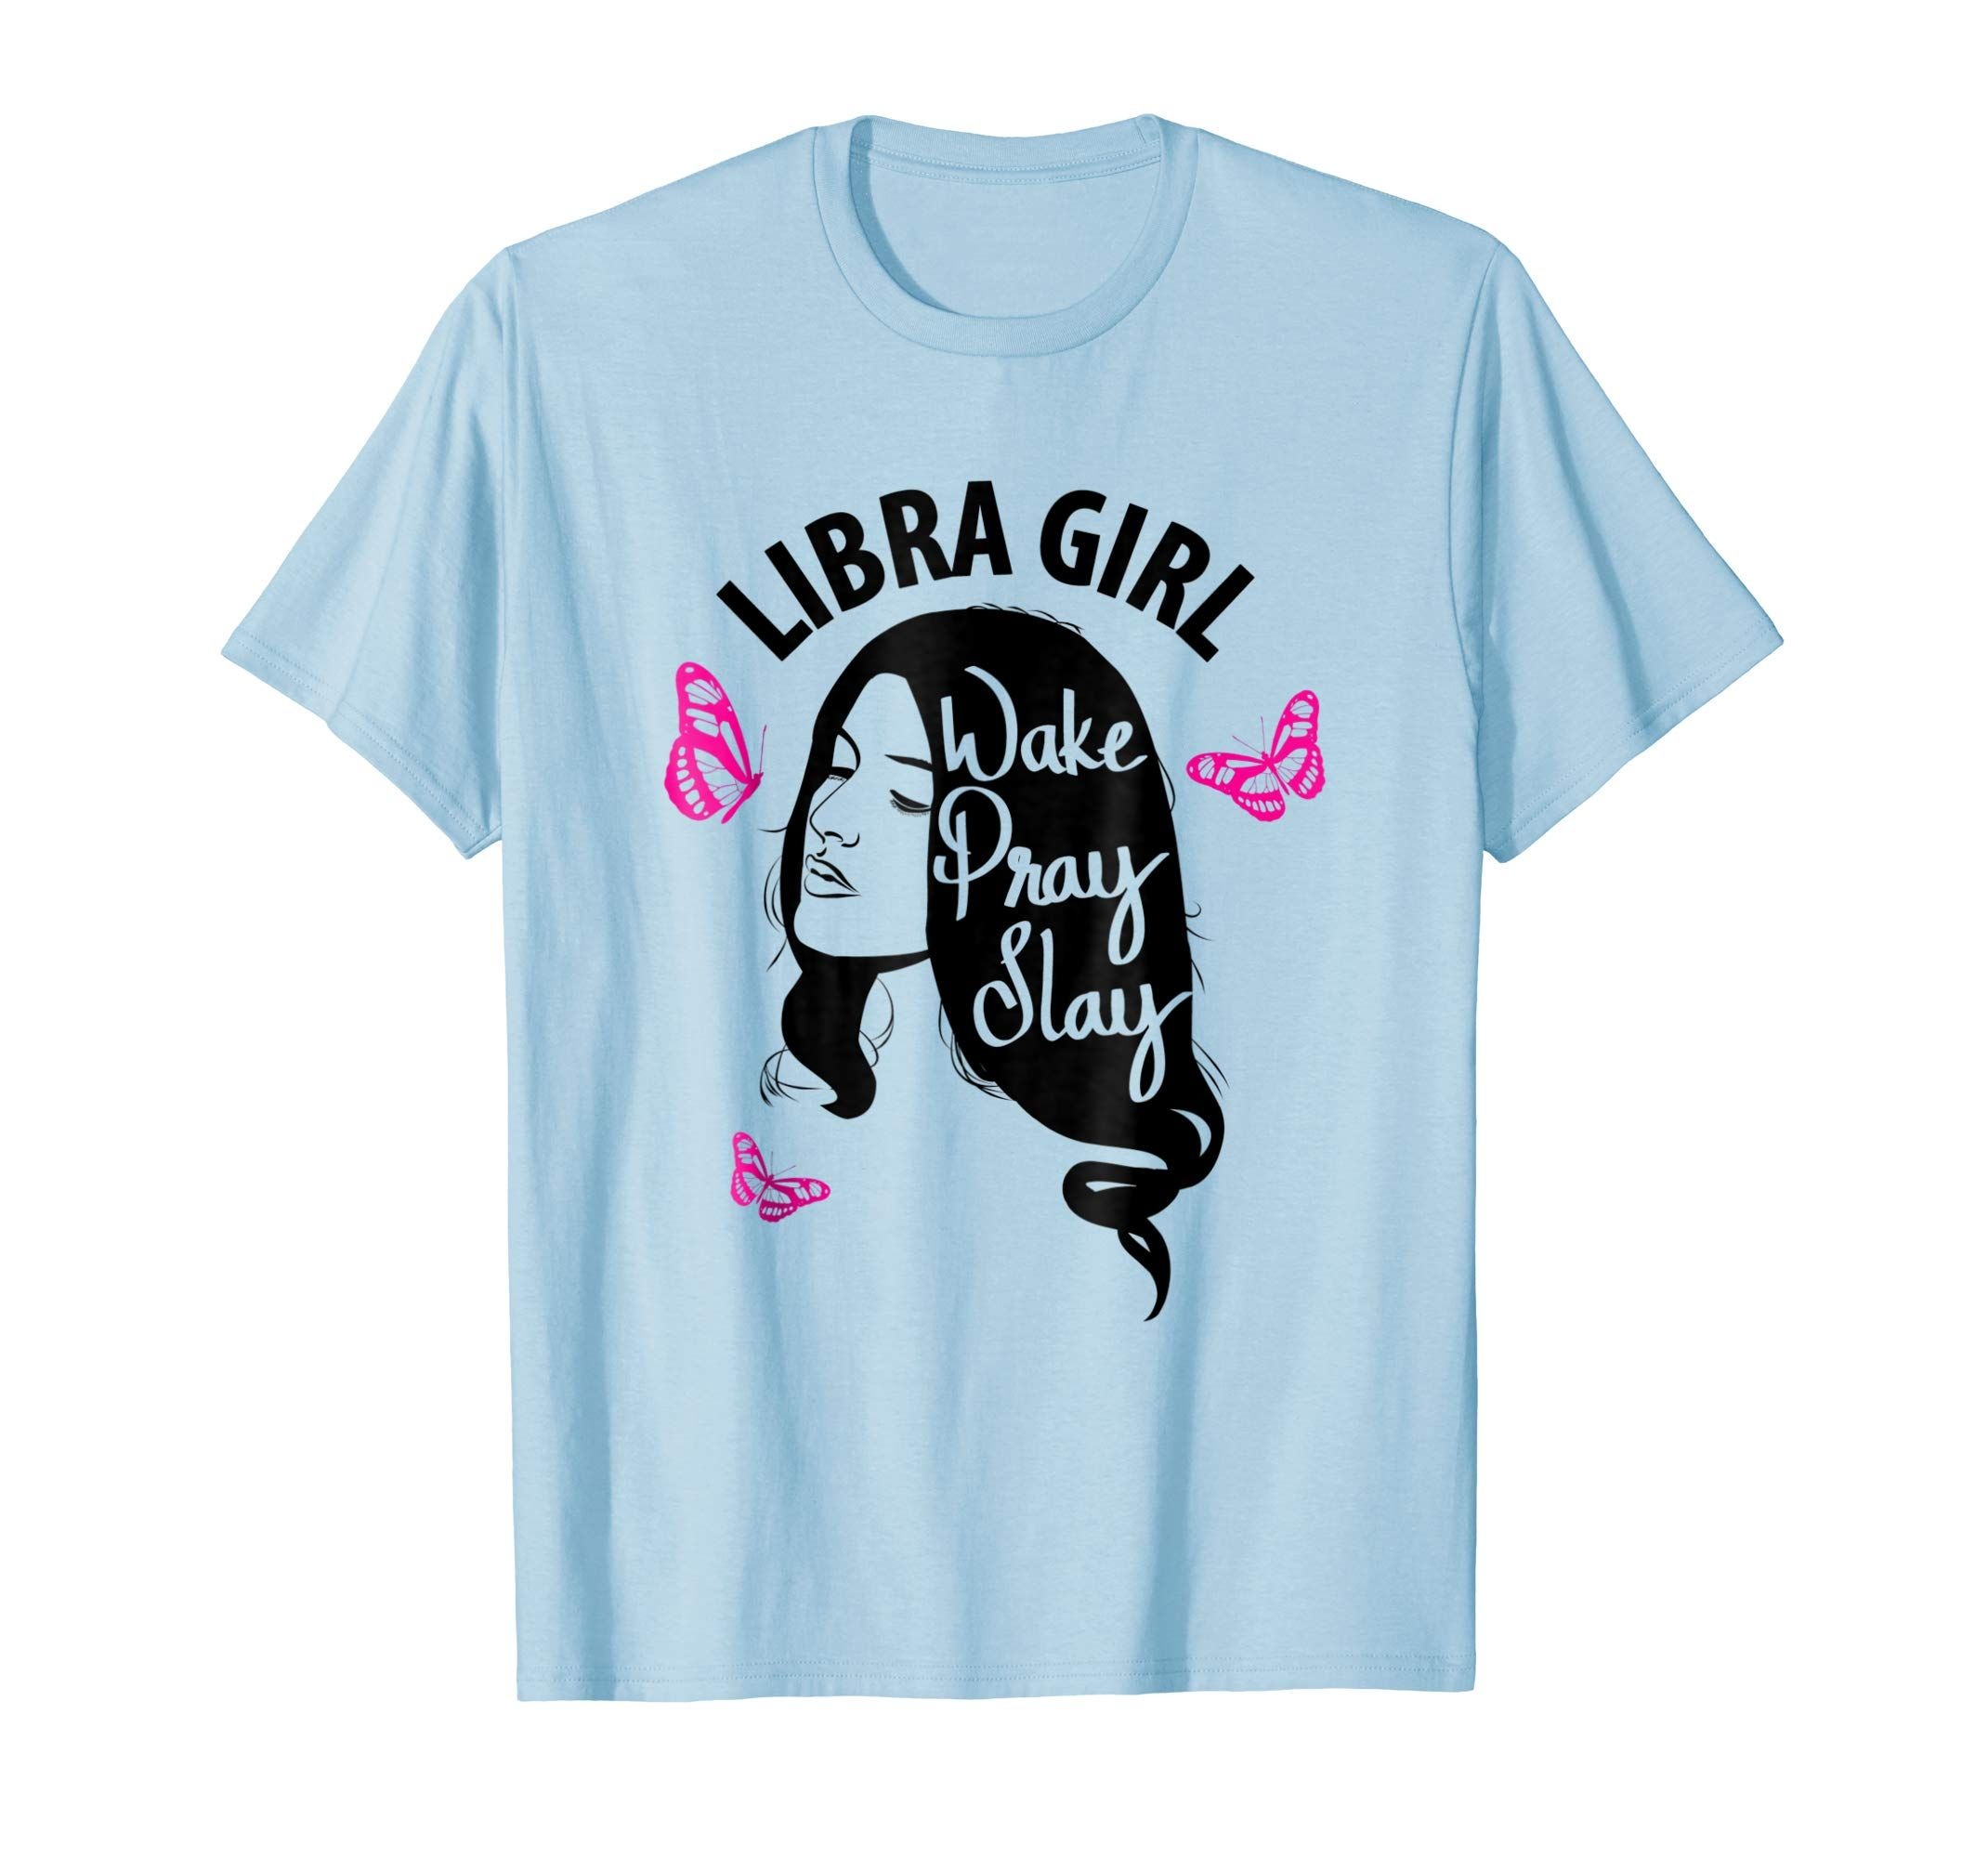 Libra Girl Wake Pray Slay Shirt October Birthday Gift For Girls